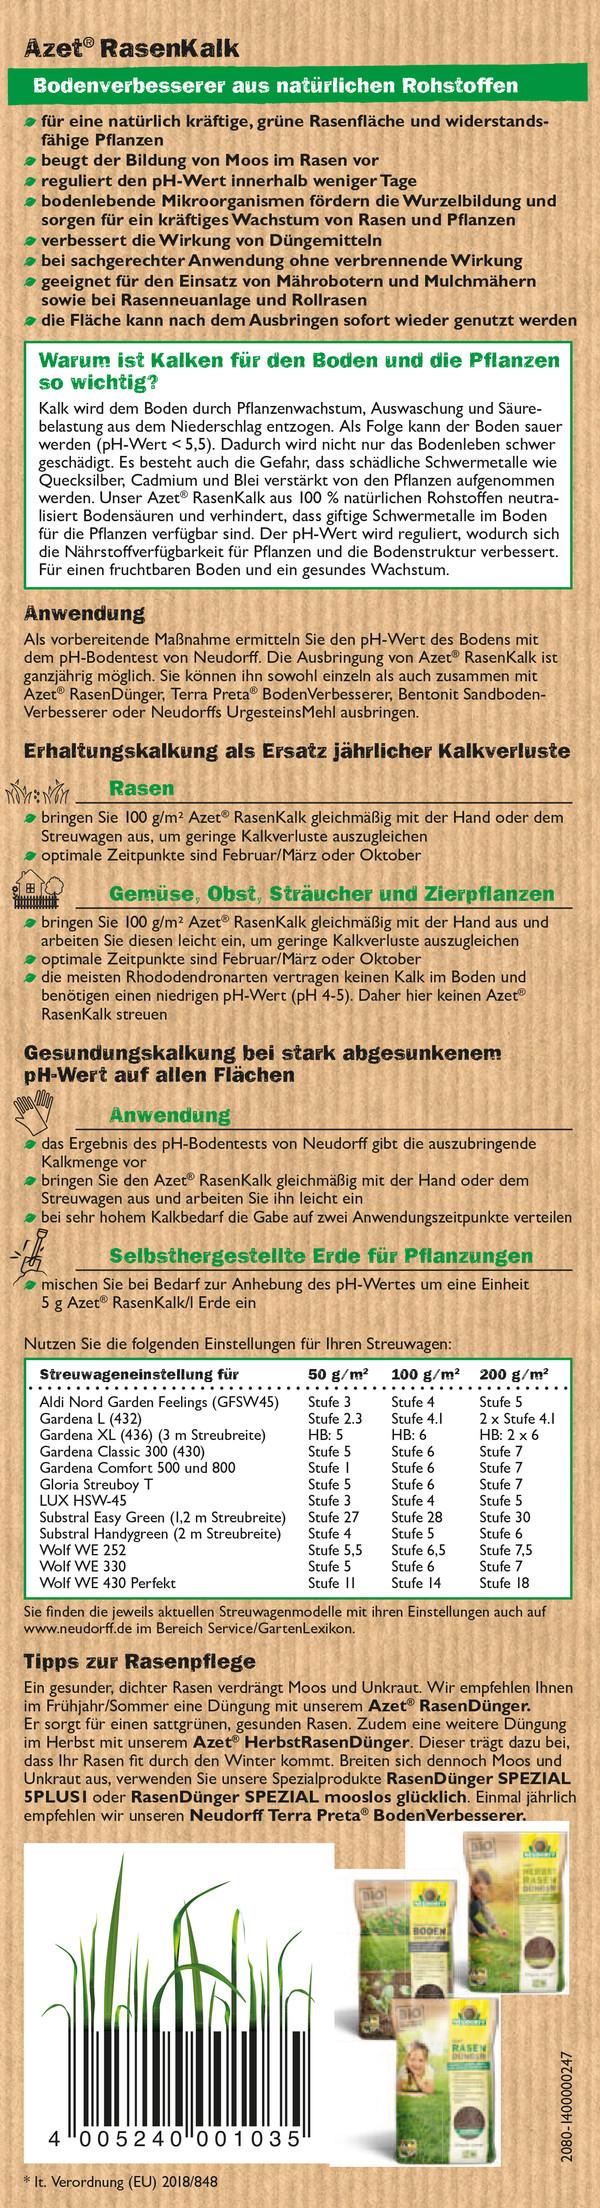 Neudorff Azet® Rasen Kalk, 10 kg